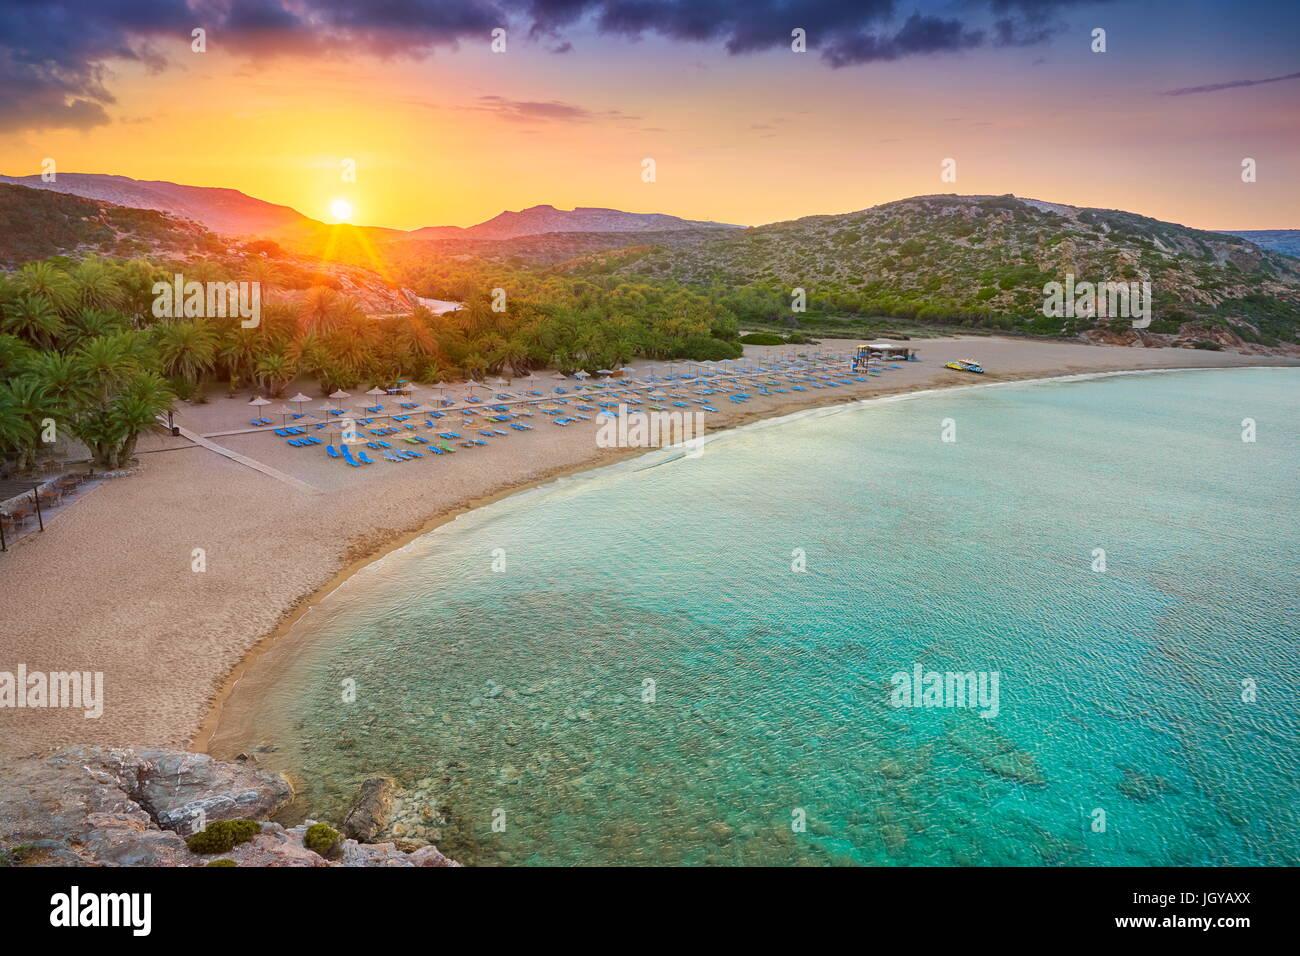 Sunset at Vai Beach, Crete Island, Greece - Stock Image